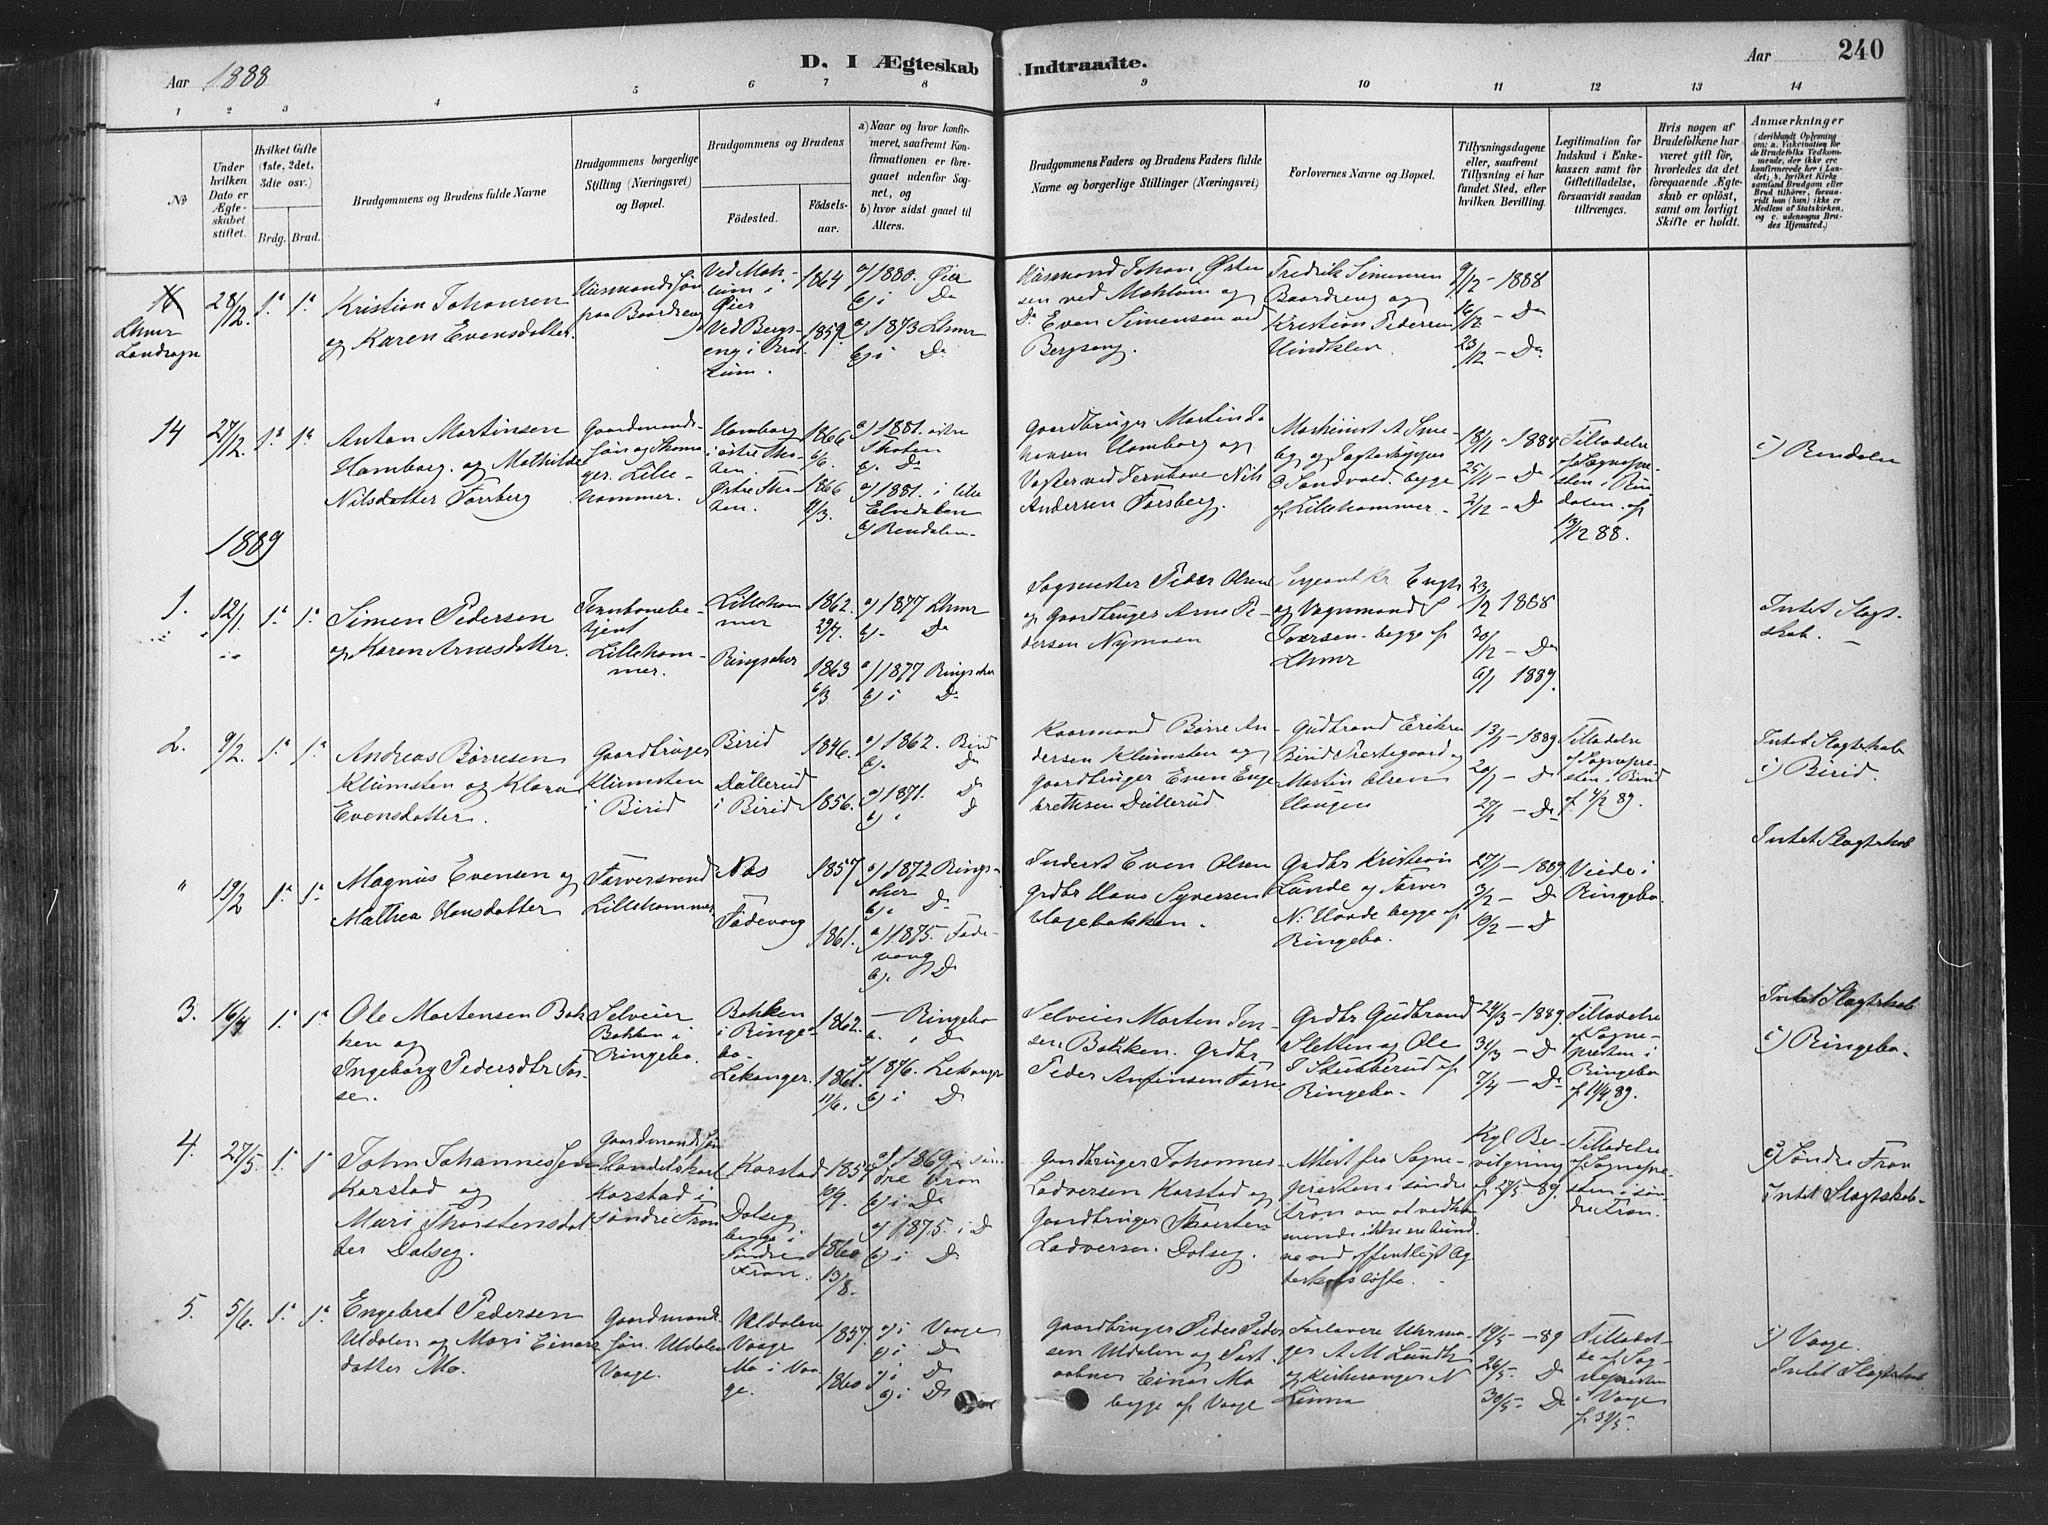 SAH, Fåberg prestekontor, H/Ha/Haa/L0010: Parish register (official) no. 10, 1879-1900, p. 240